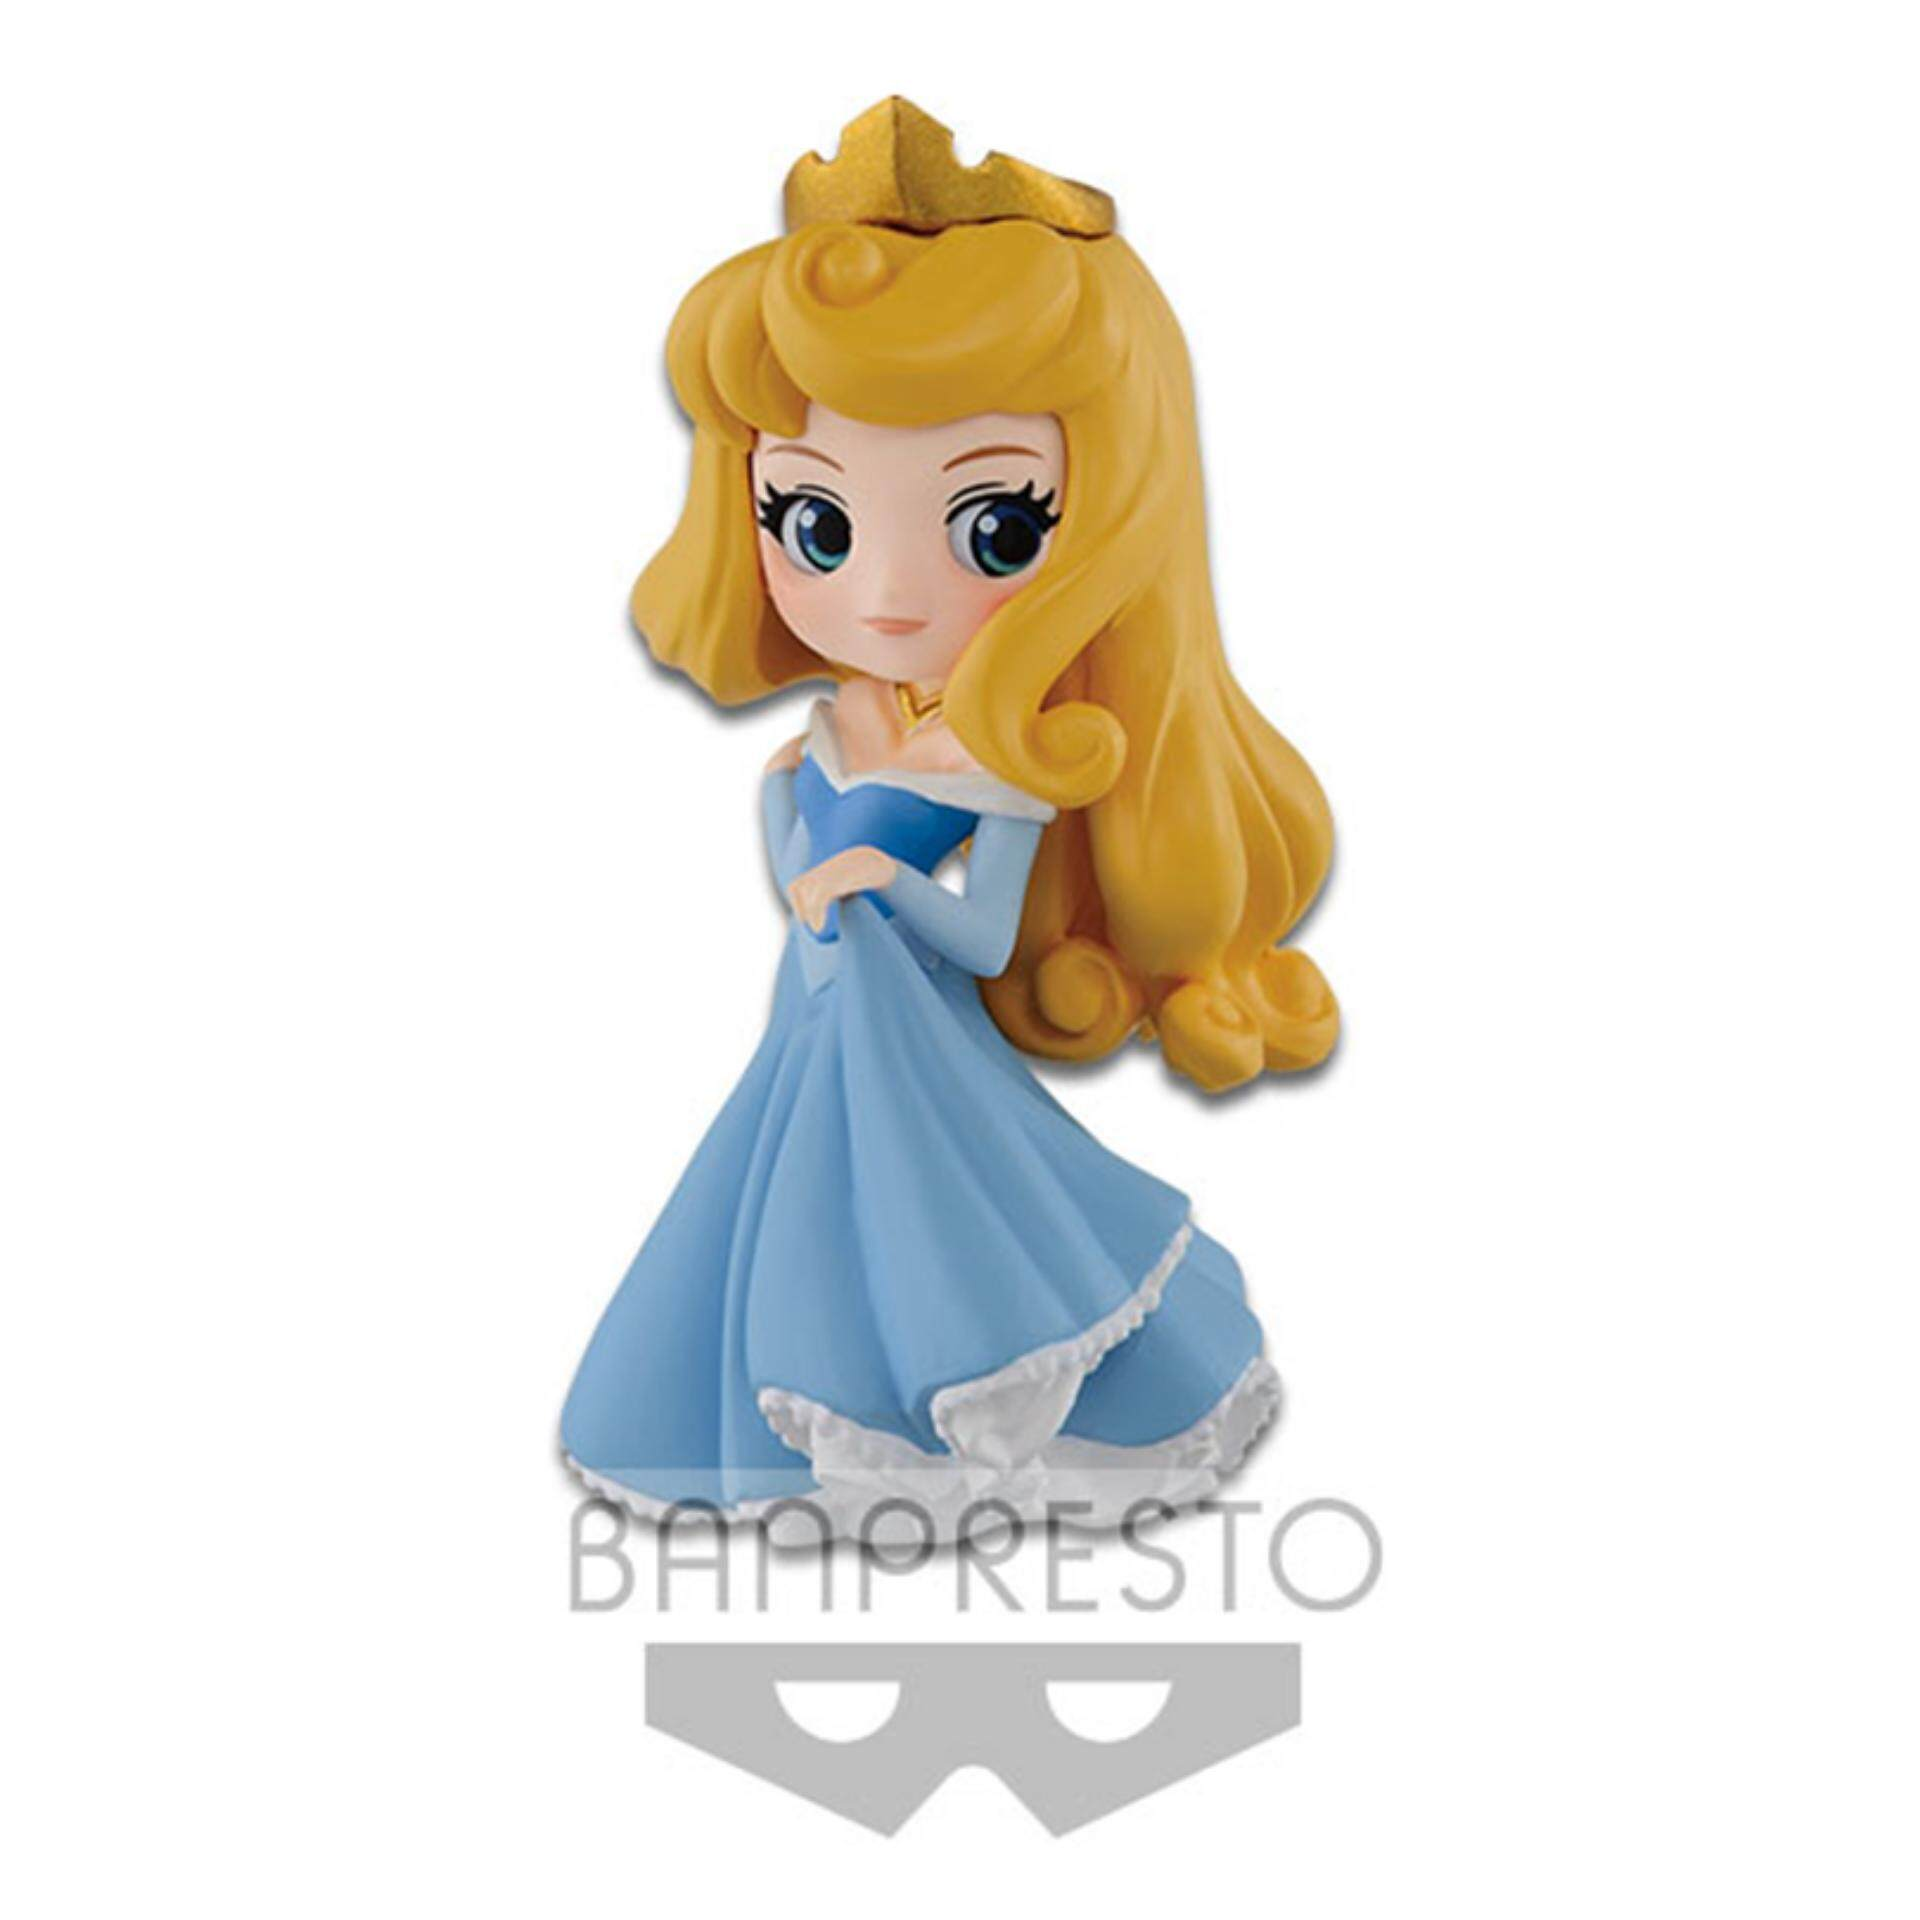 Banpresto Q Posket Disney Princess Petit Figure Aurora